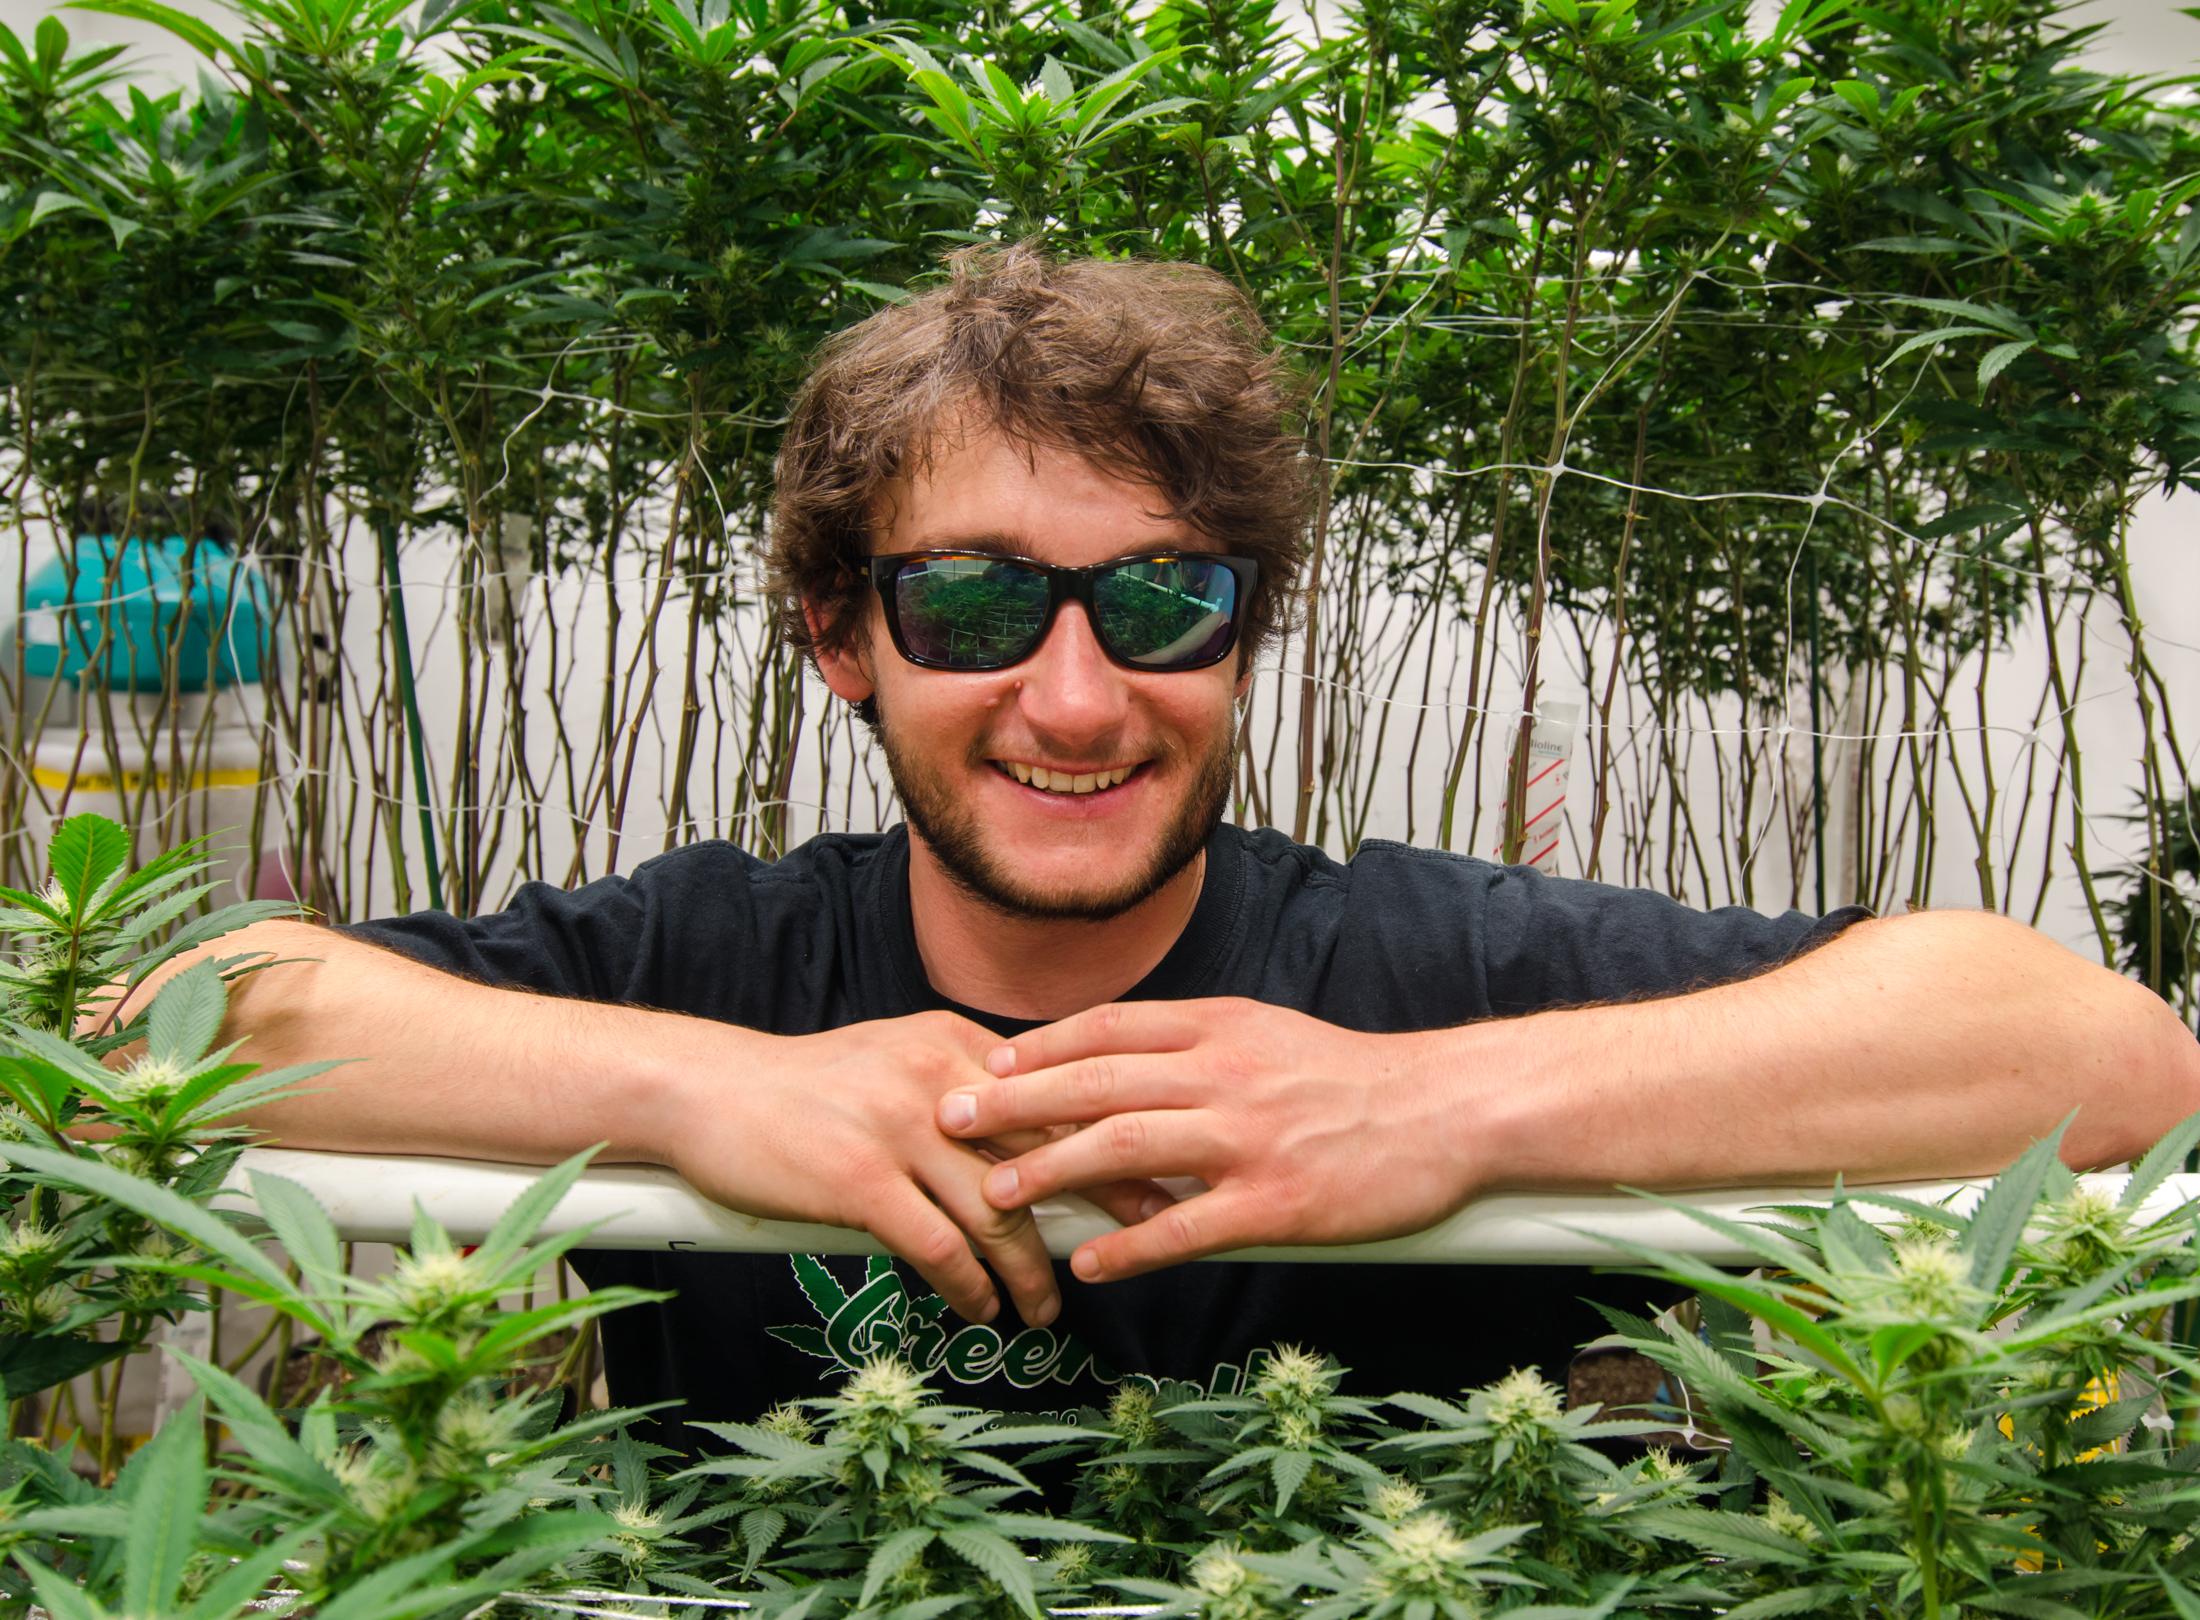 The Greenery Grow, marijuana grow, cannabis, cultivation, Indiana Bubblegum, Pakistani Chitral Kush, Durango weed